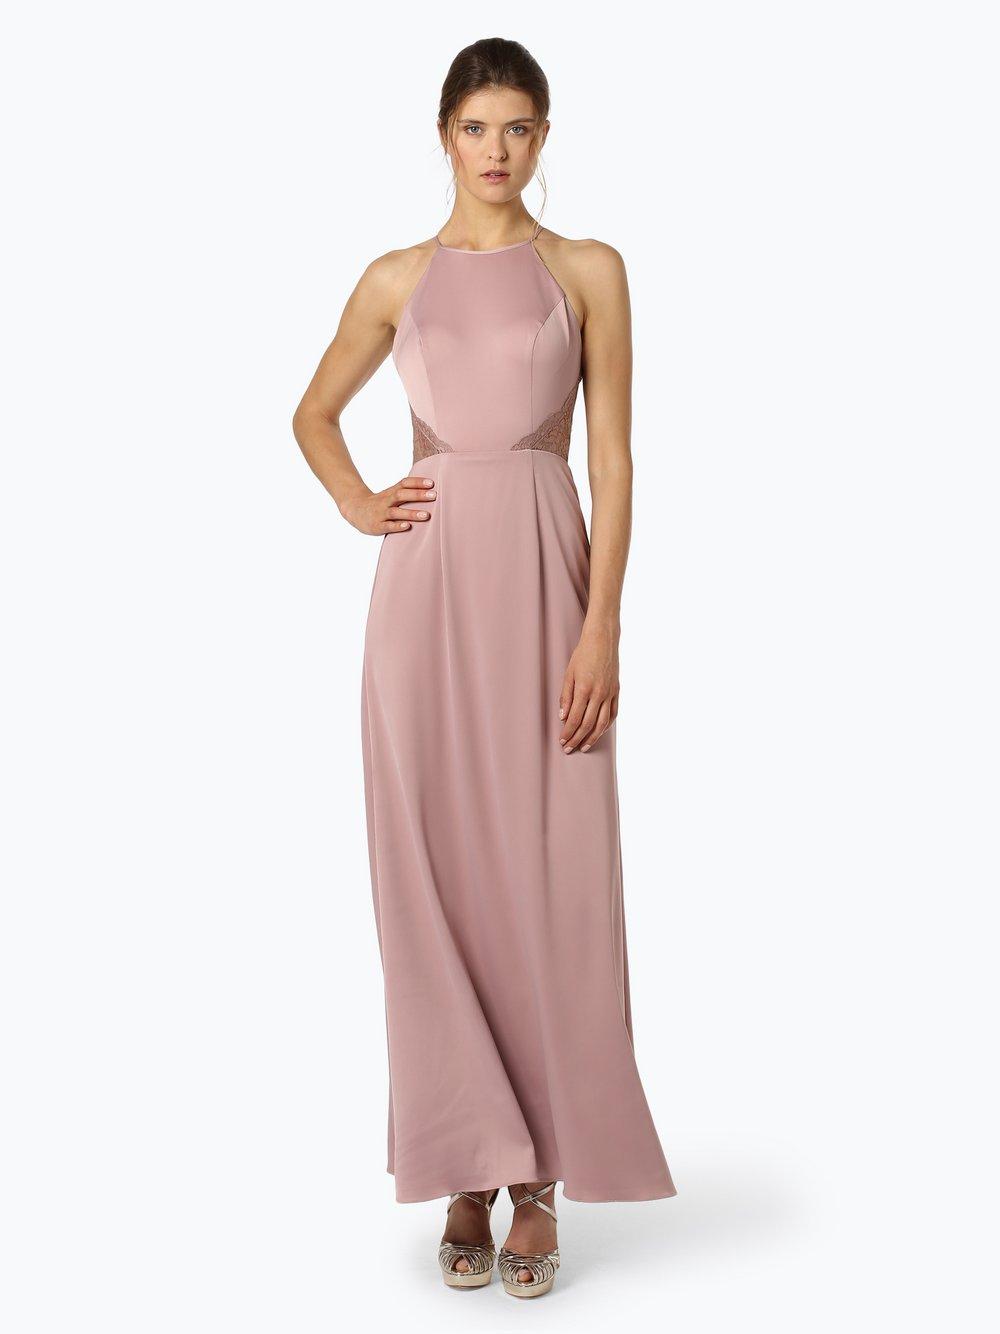 Laona – Damska sukienka wieczorowa, różowy Van Graaf 443743-0001-09920